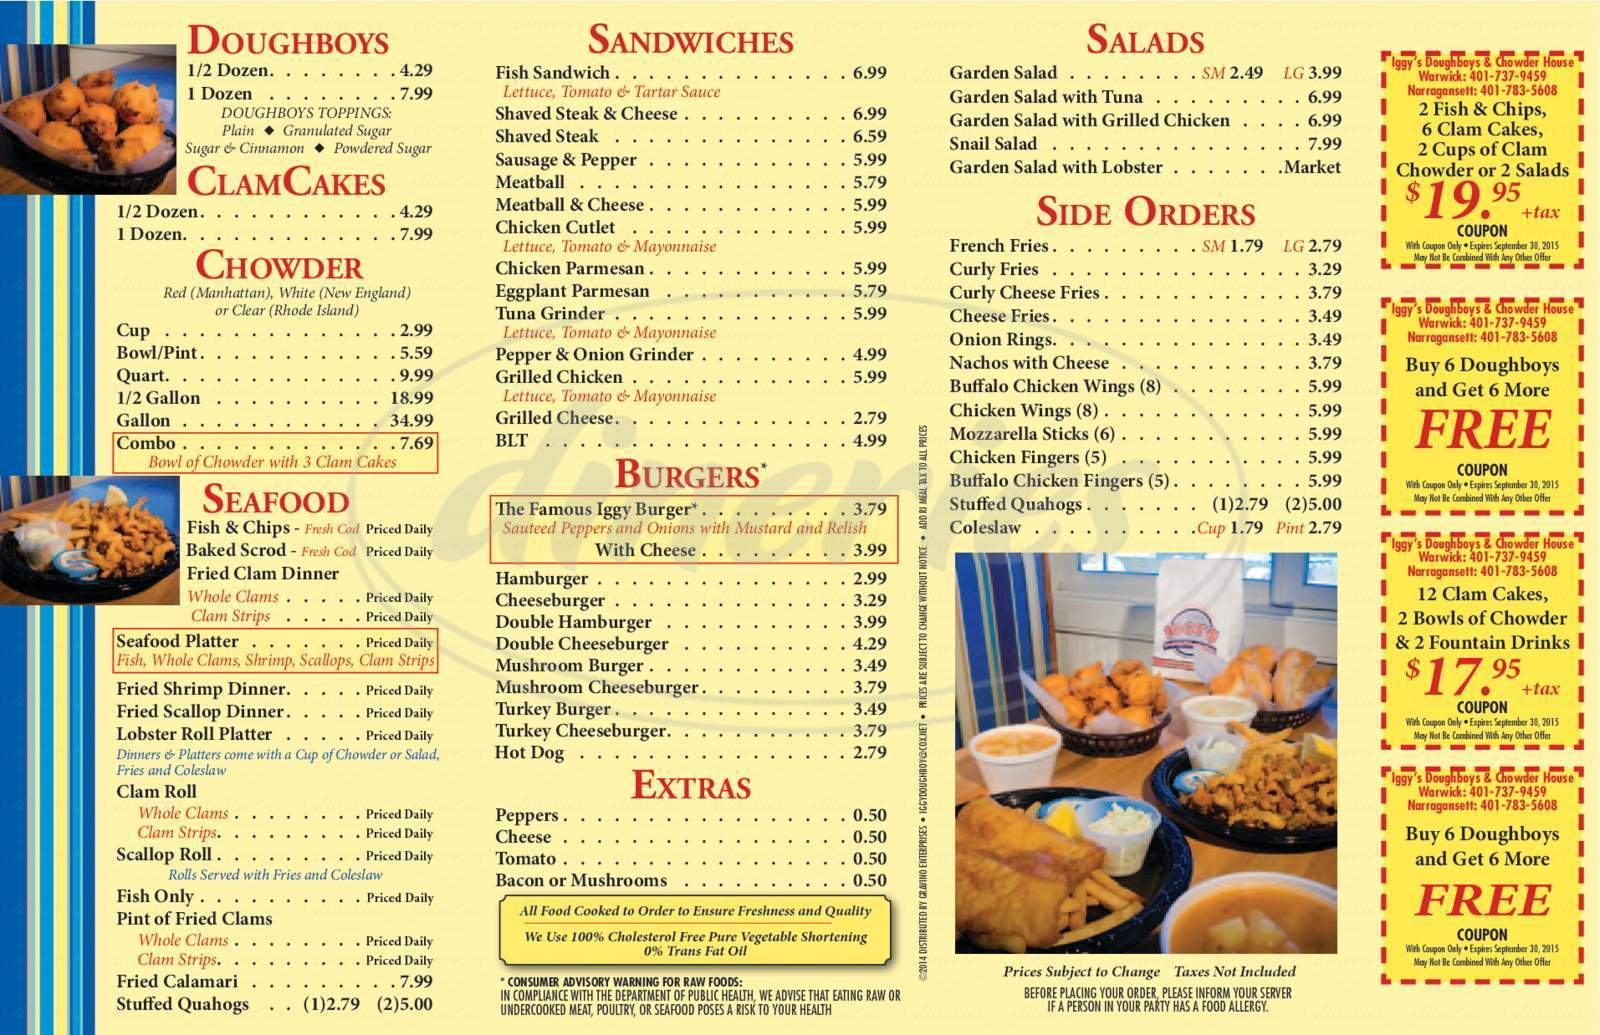 menu for Iggy's Doughboys and Chowder